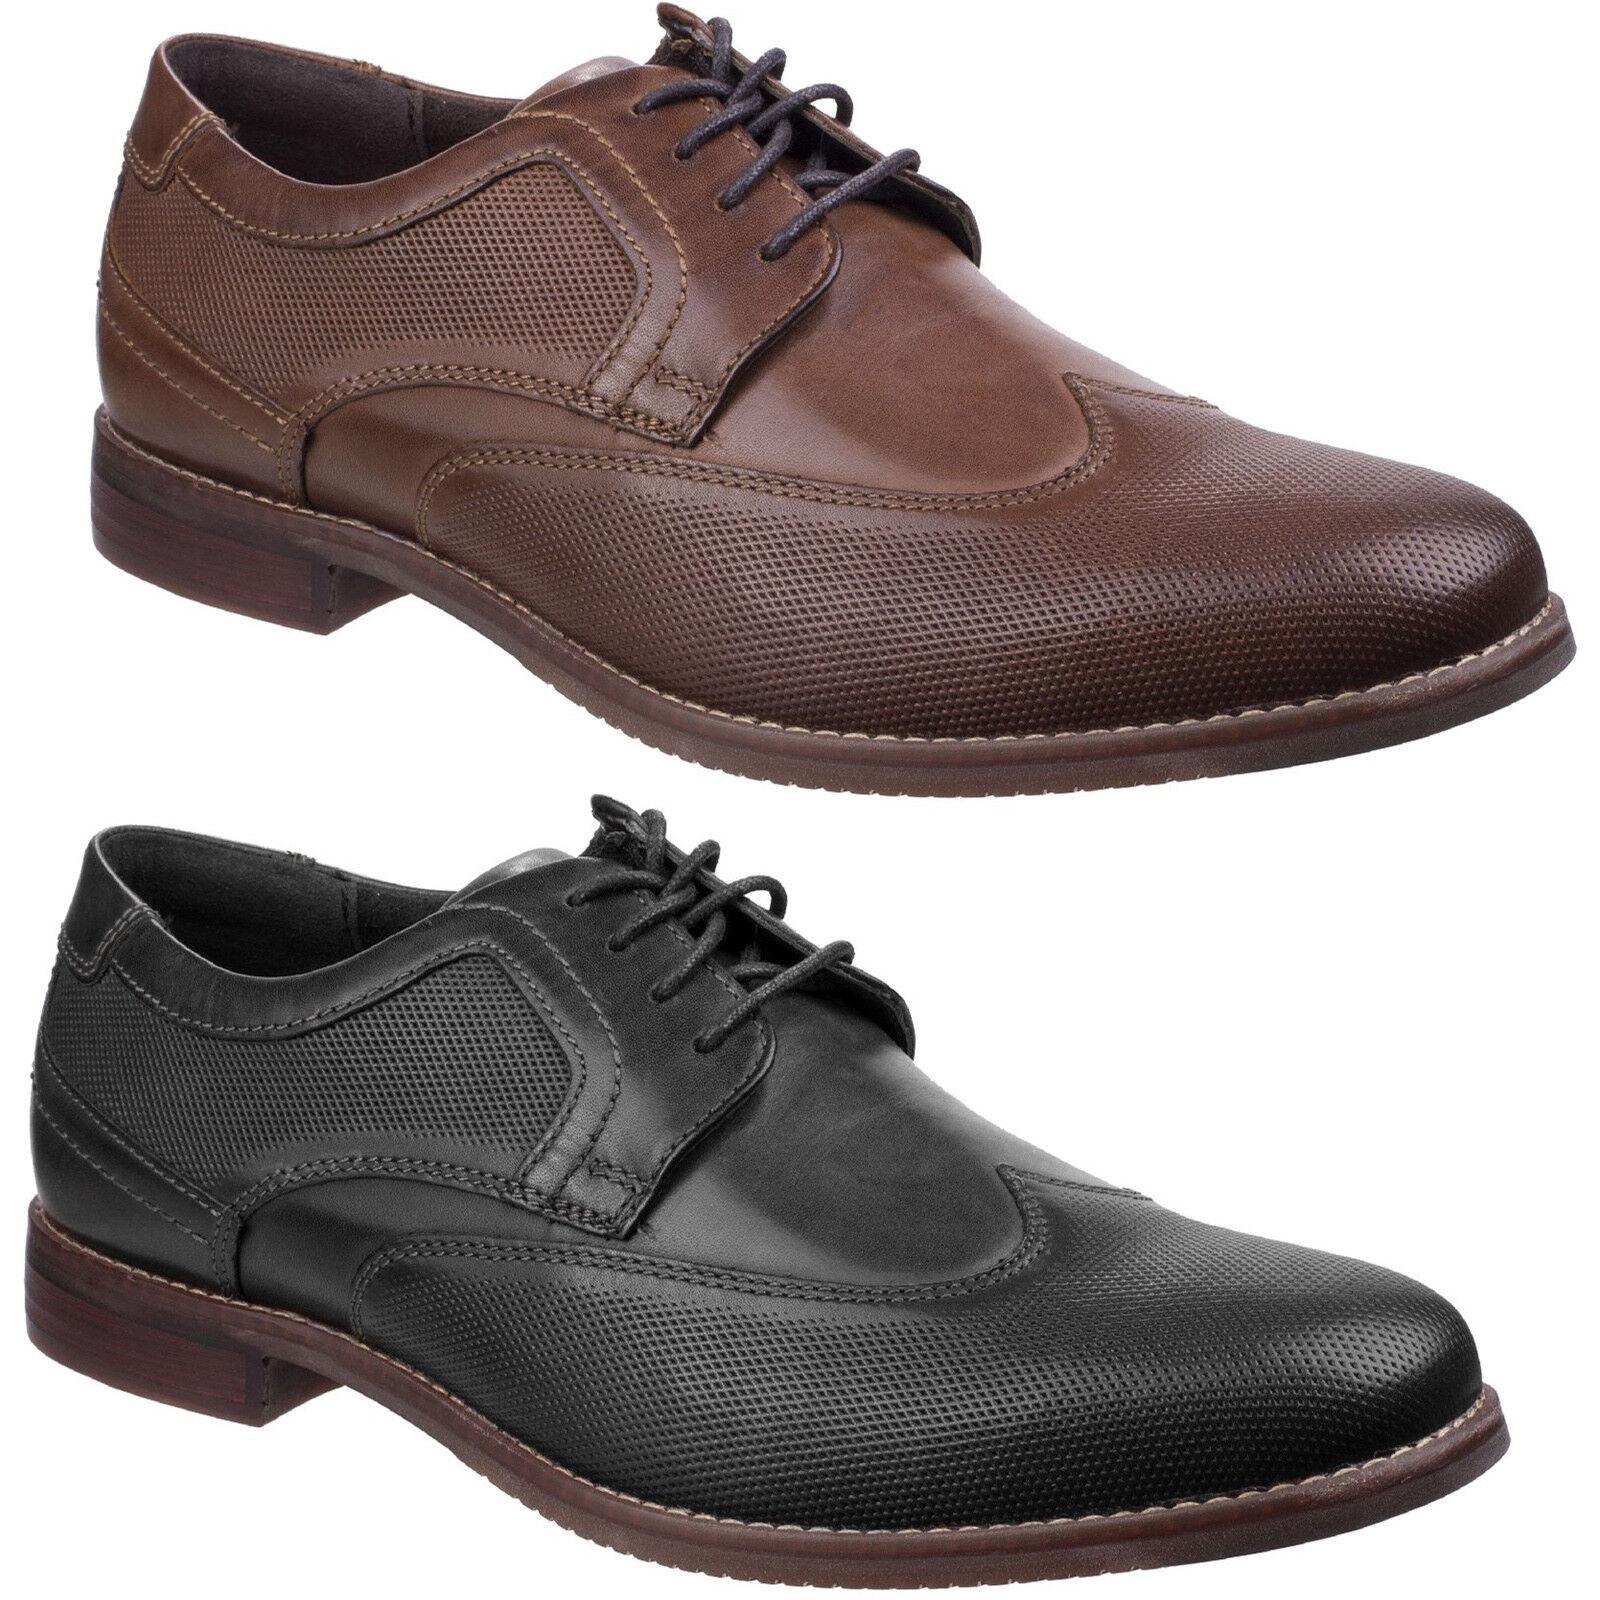 Rockport Style Zweck Perforiert Herren Schuhe Klassisch Leder Flügelspitze Smart